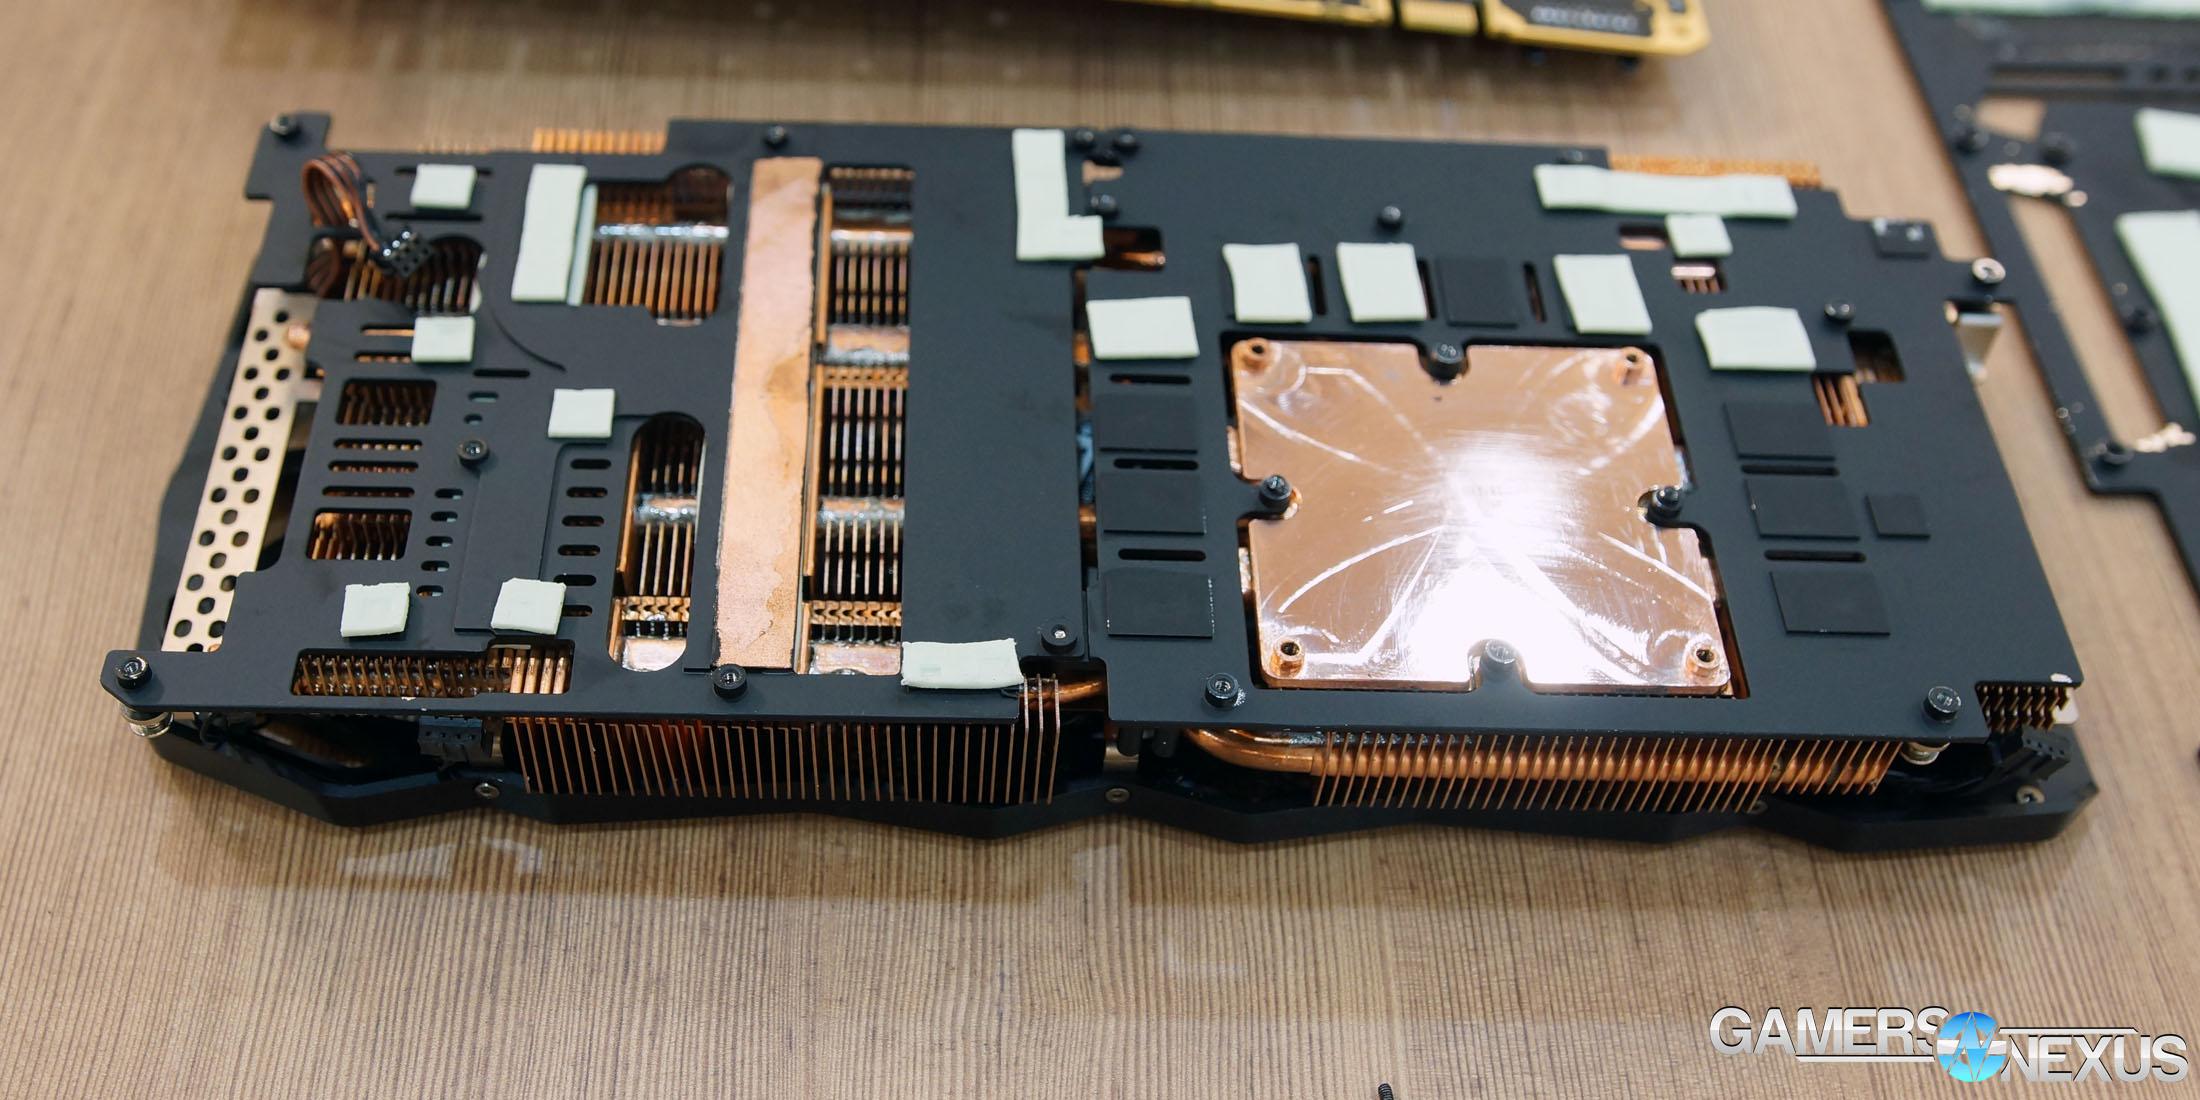 EVGA 1080 Ti Kingpin In-Depth: VRM Components, Tear-Down